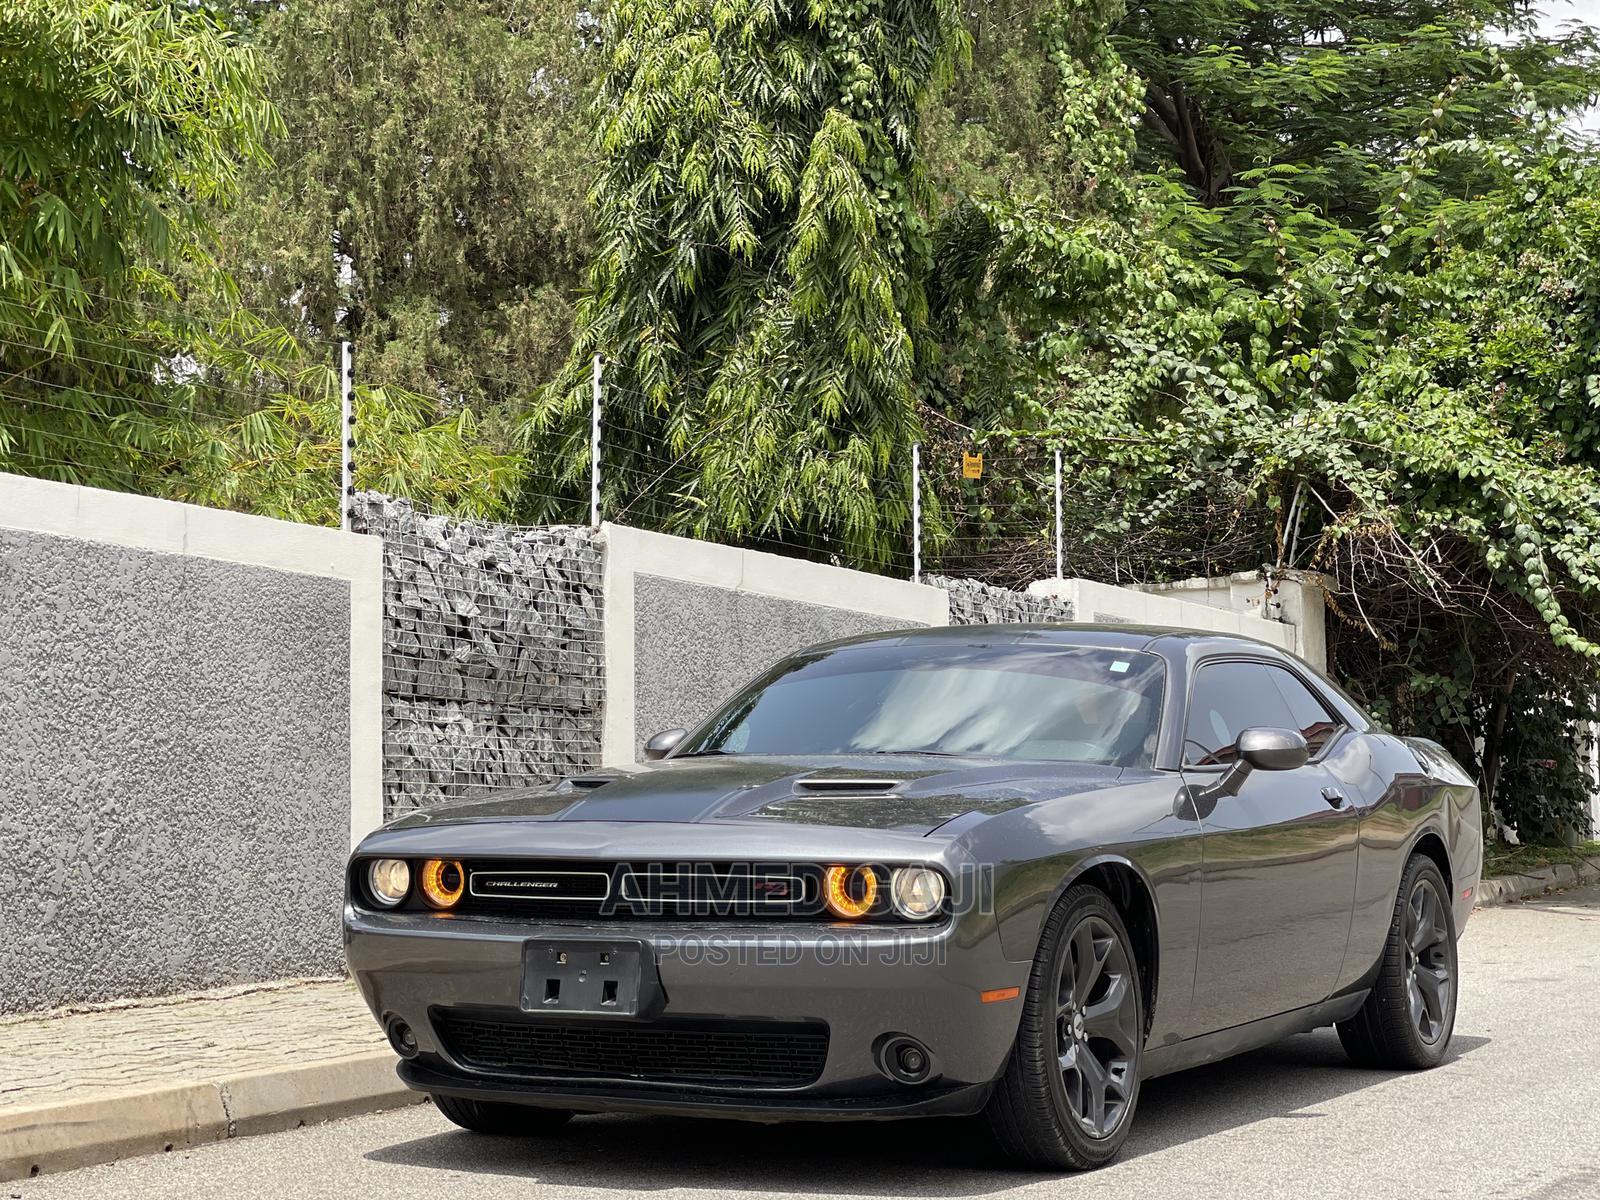 Dodge Challenger 2017 R/T RWD Gray